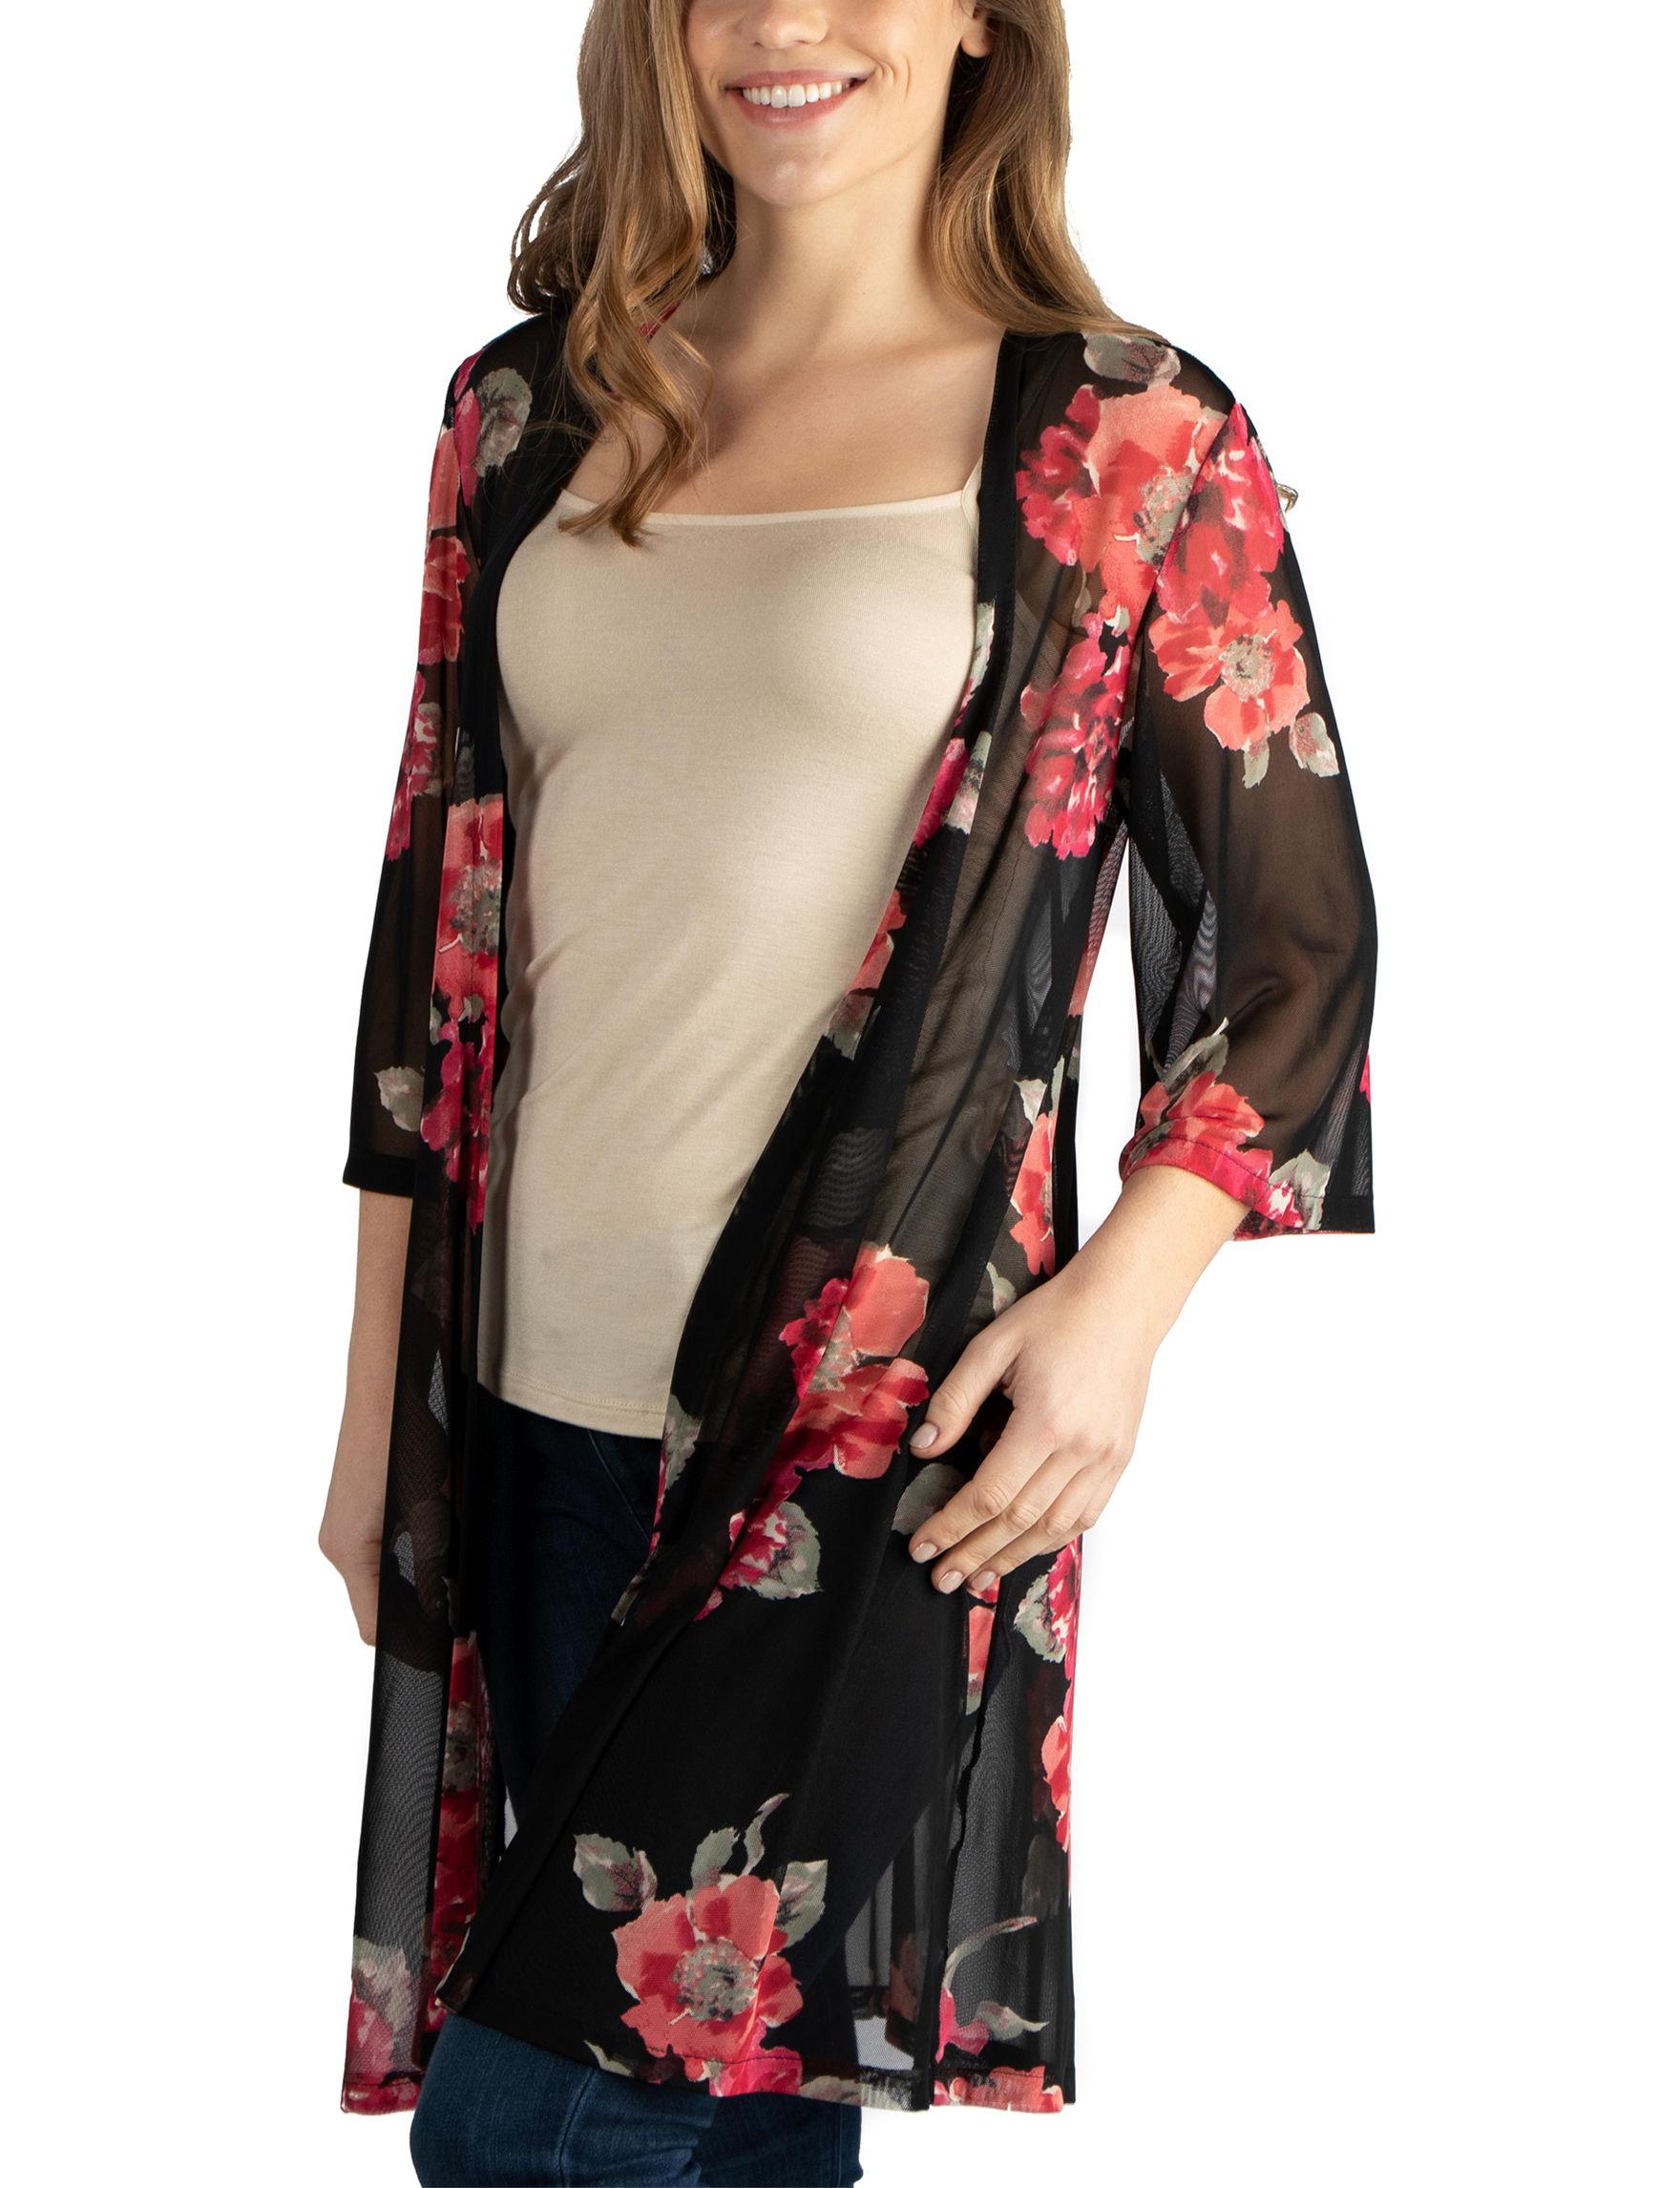 fc4a329074 24Seven Comfort Apparel Maternity Floral Kimono Cardigan